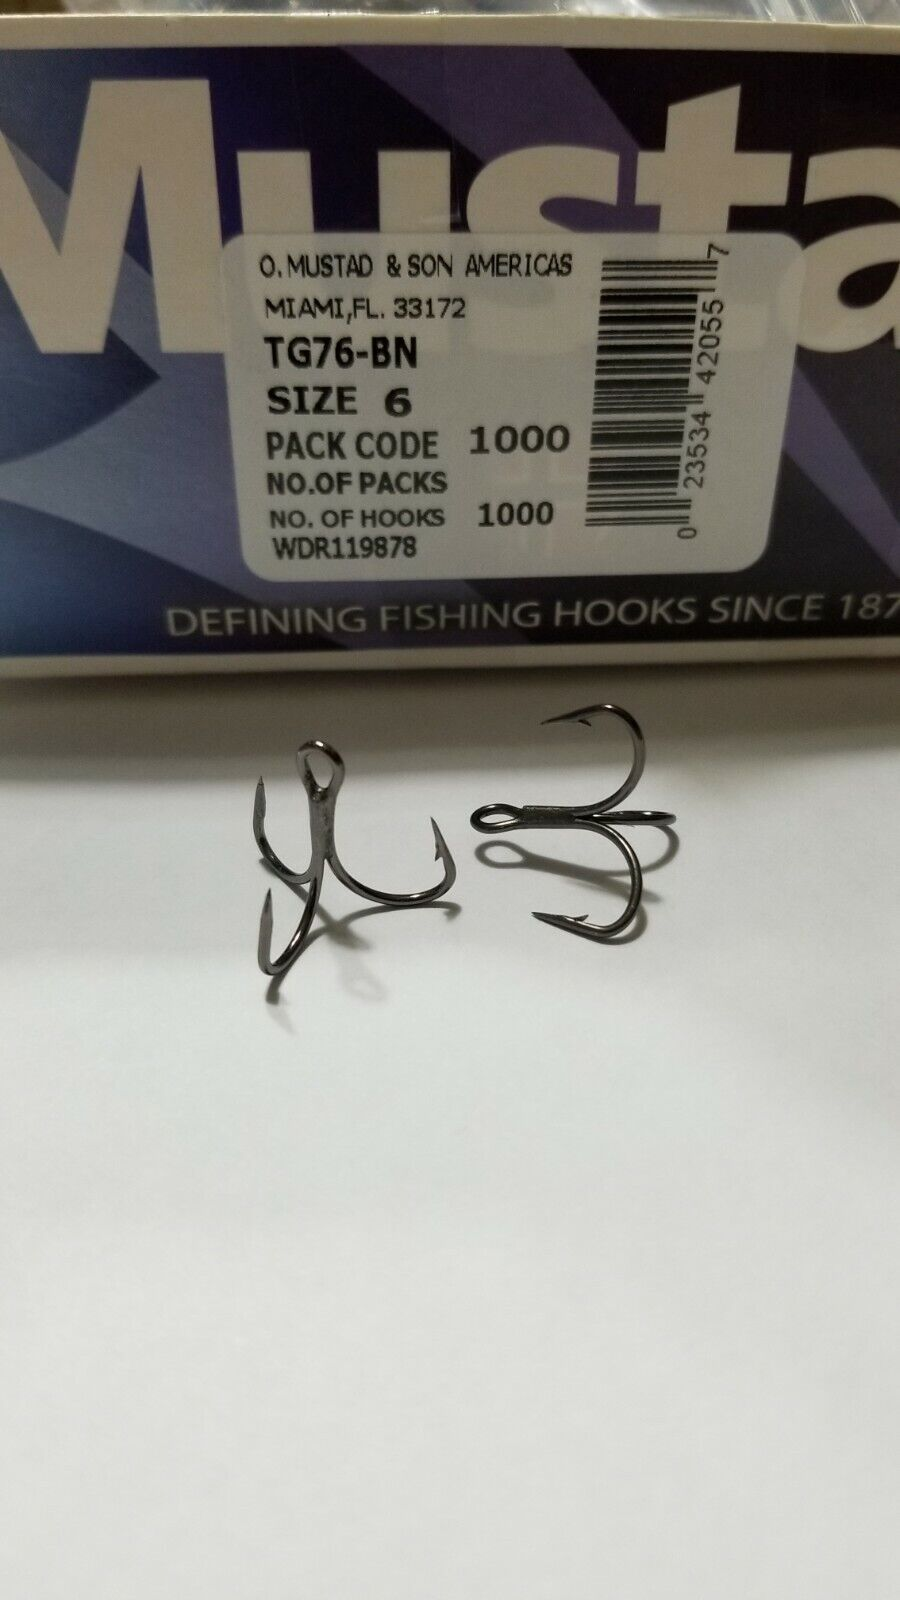 Mustad Kvd Elite Triple Grip Hook Tg76bn For Sale Online Ebay